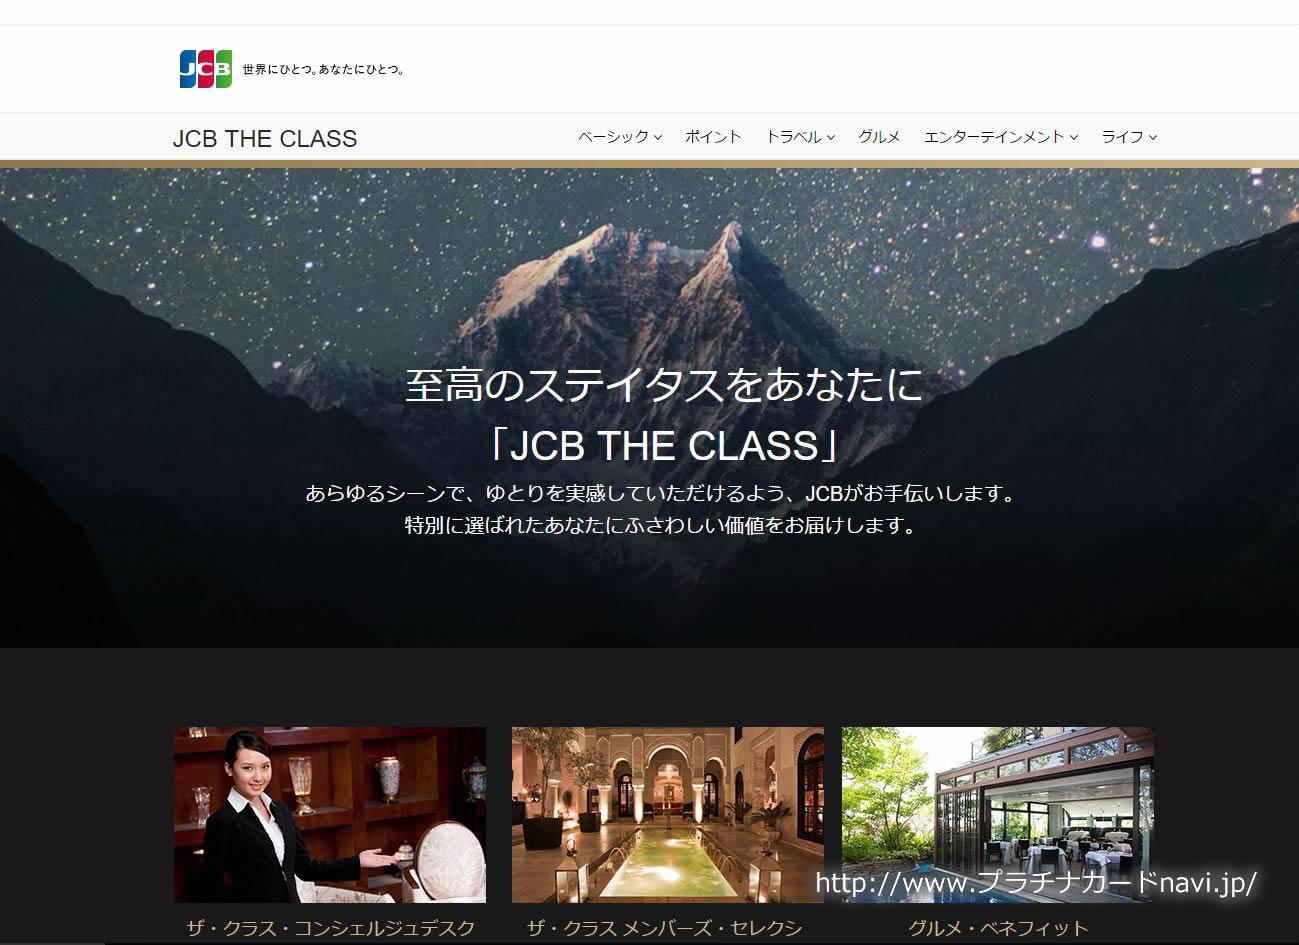 jcb_20161121_new_the_class